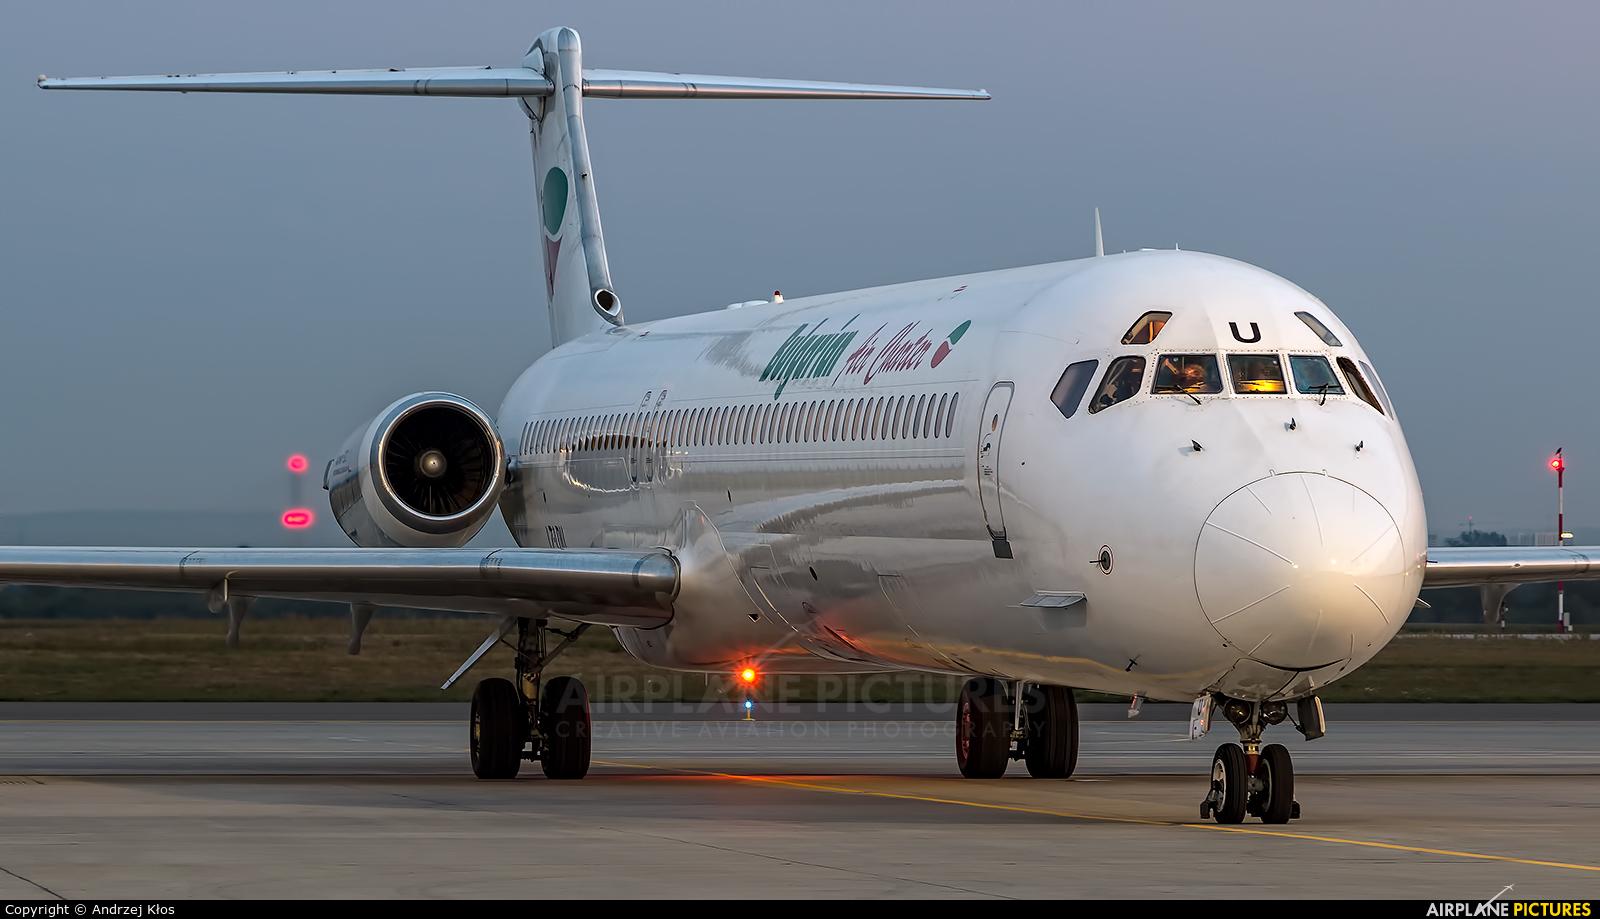 Bulgarian Air Charter LZ-LDU aircraft at Rzeszów-Jasionka